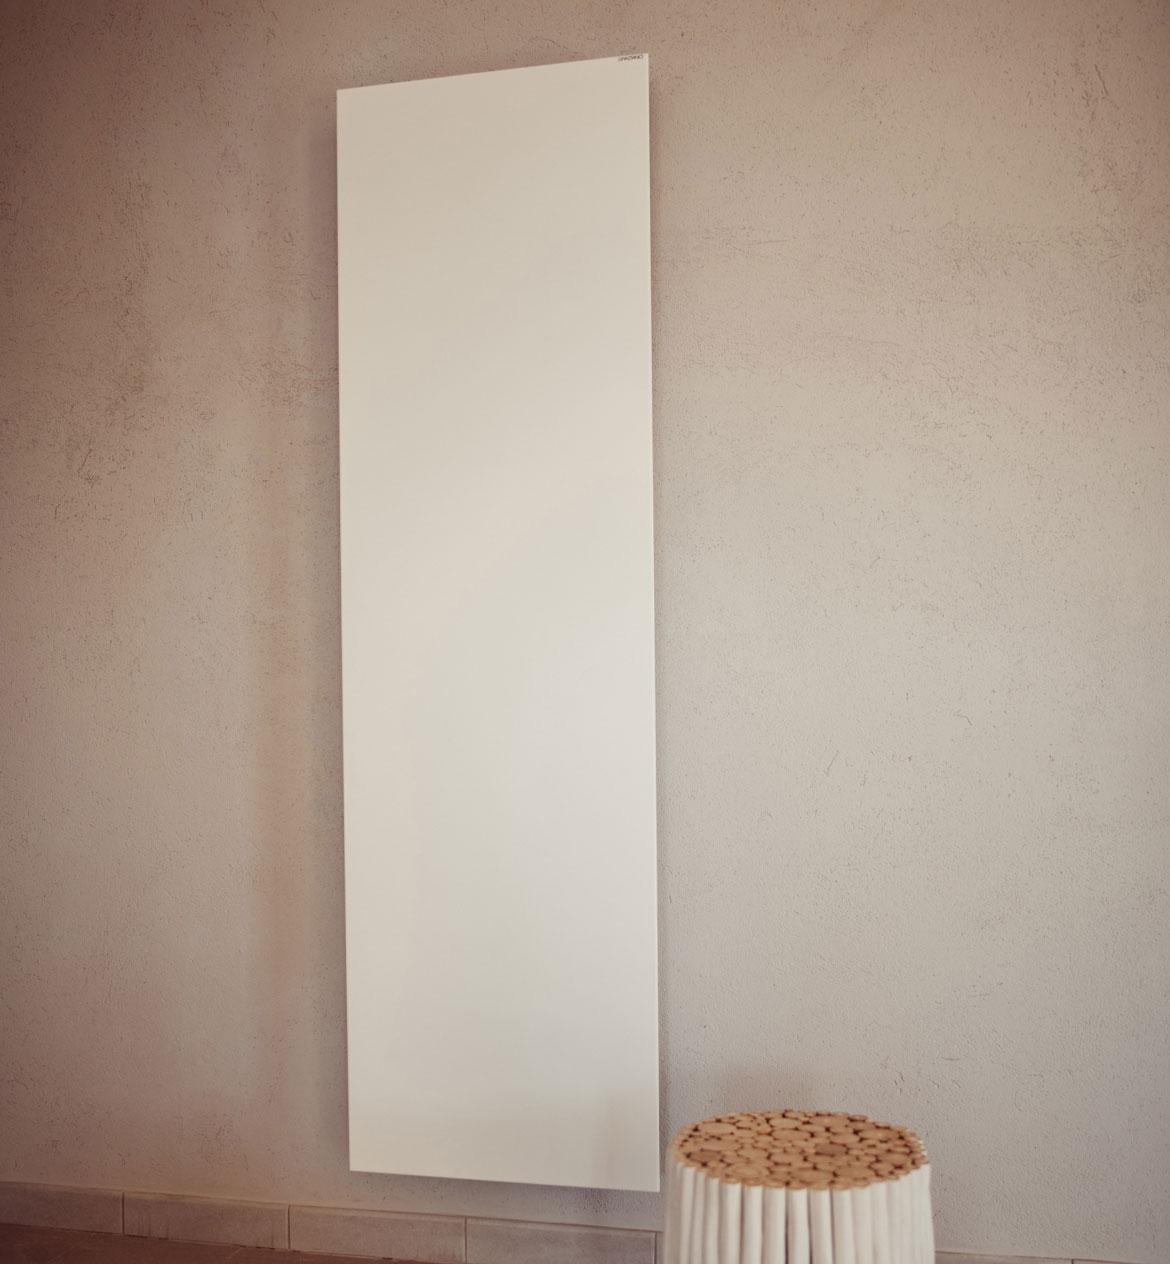 termoarredo-a-piastra-vanity-graziano-radiators